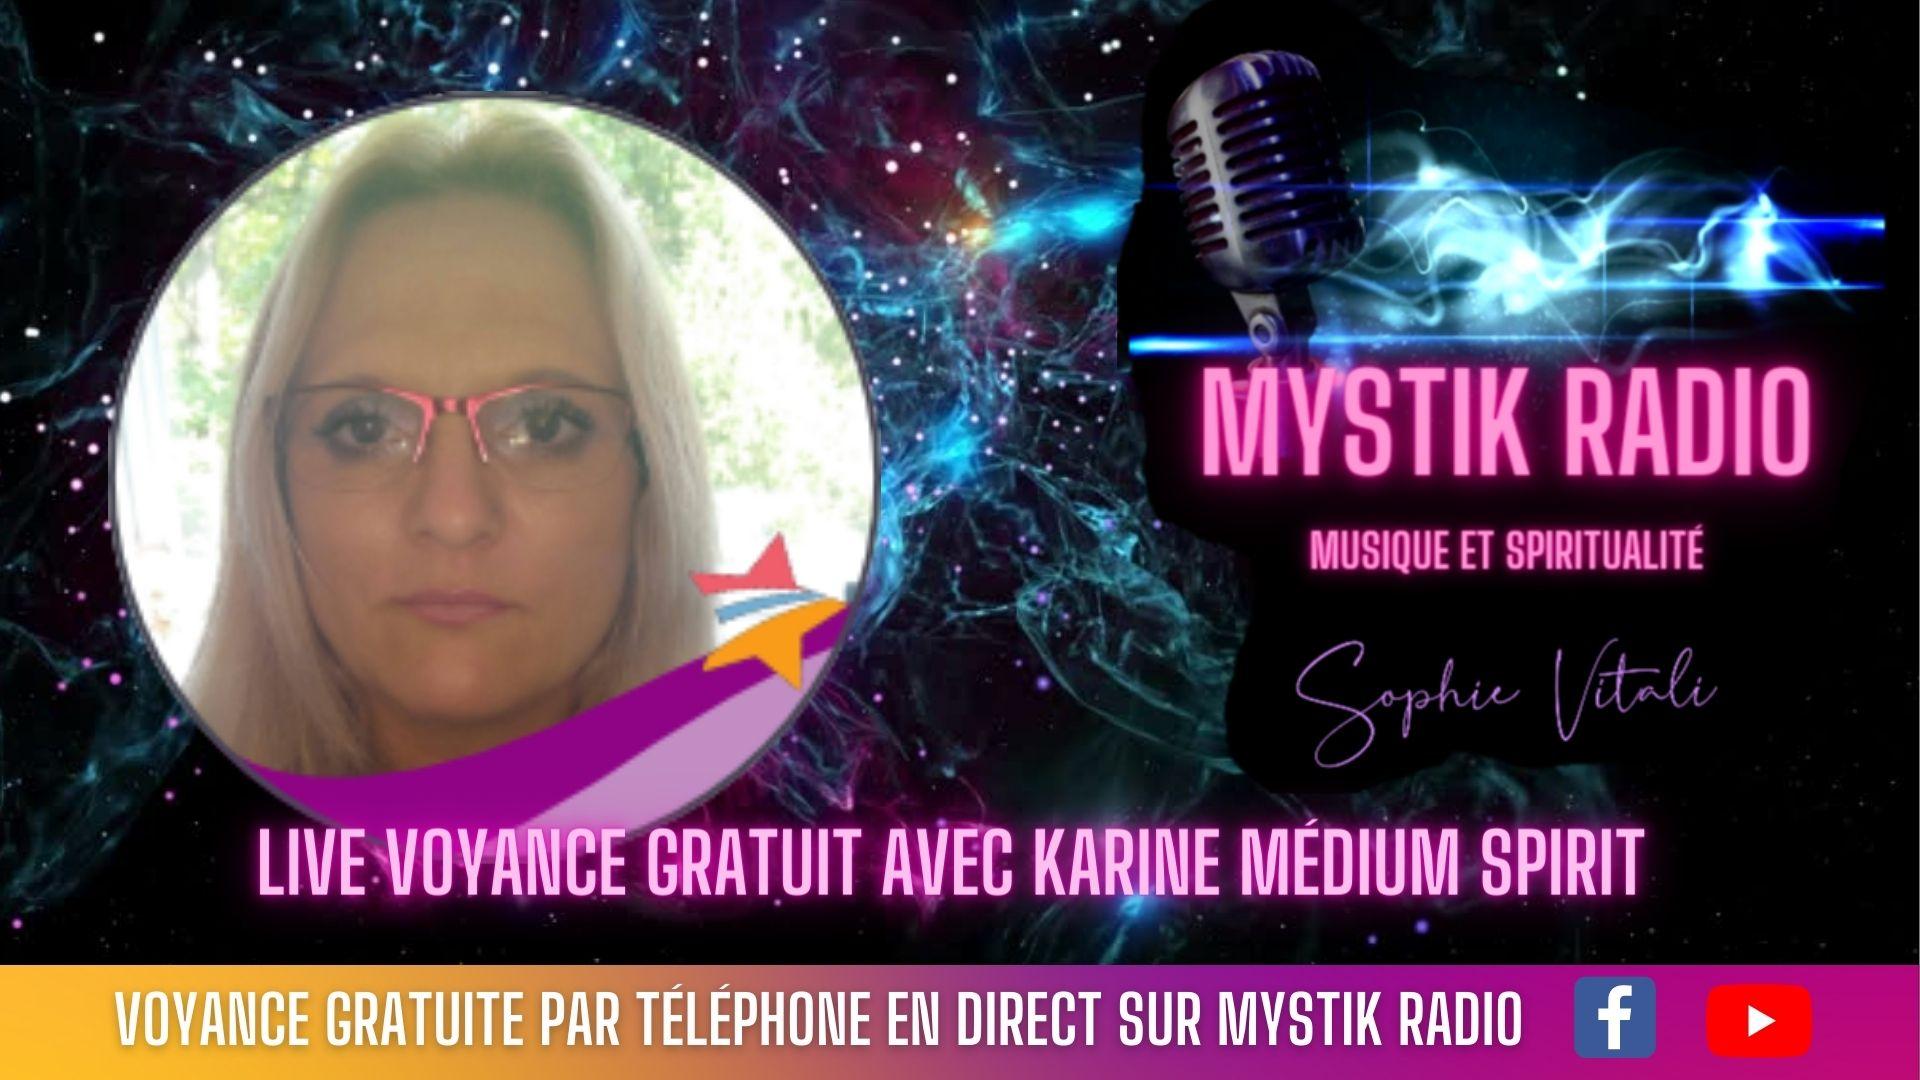 Voyance gratuite en ligne avec Karine médium spirit sur Mystik Radio